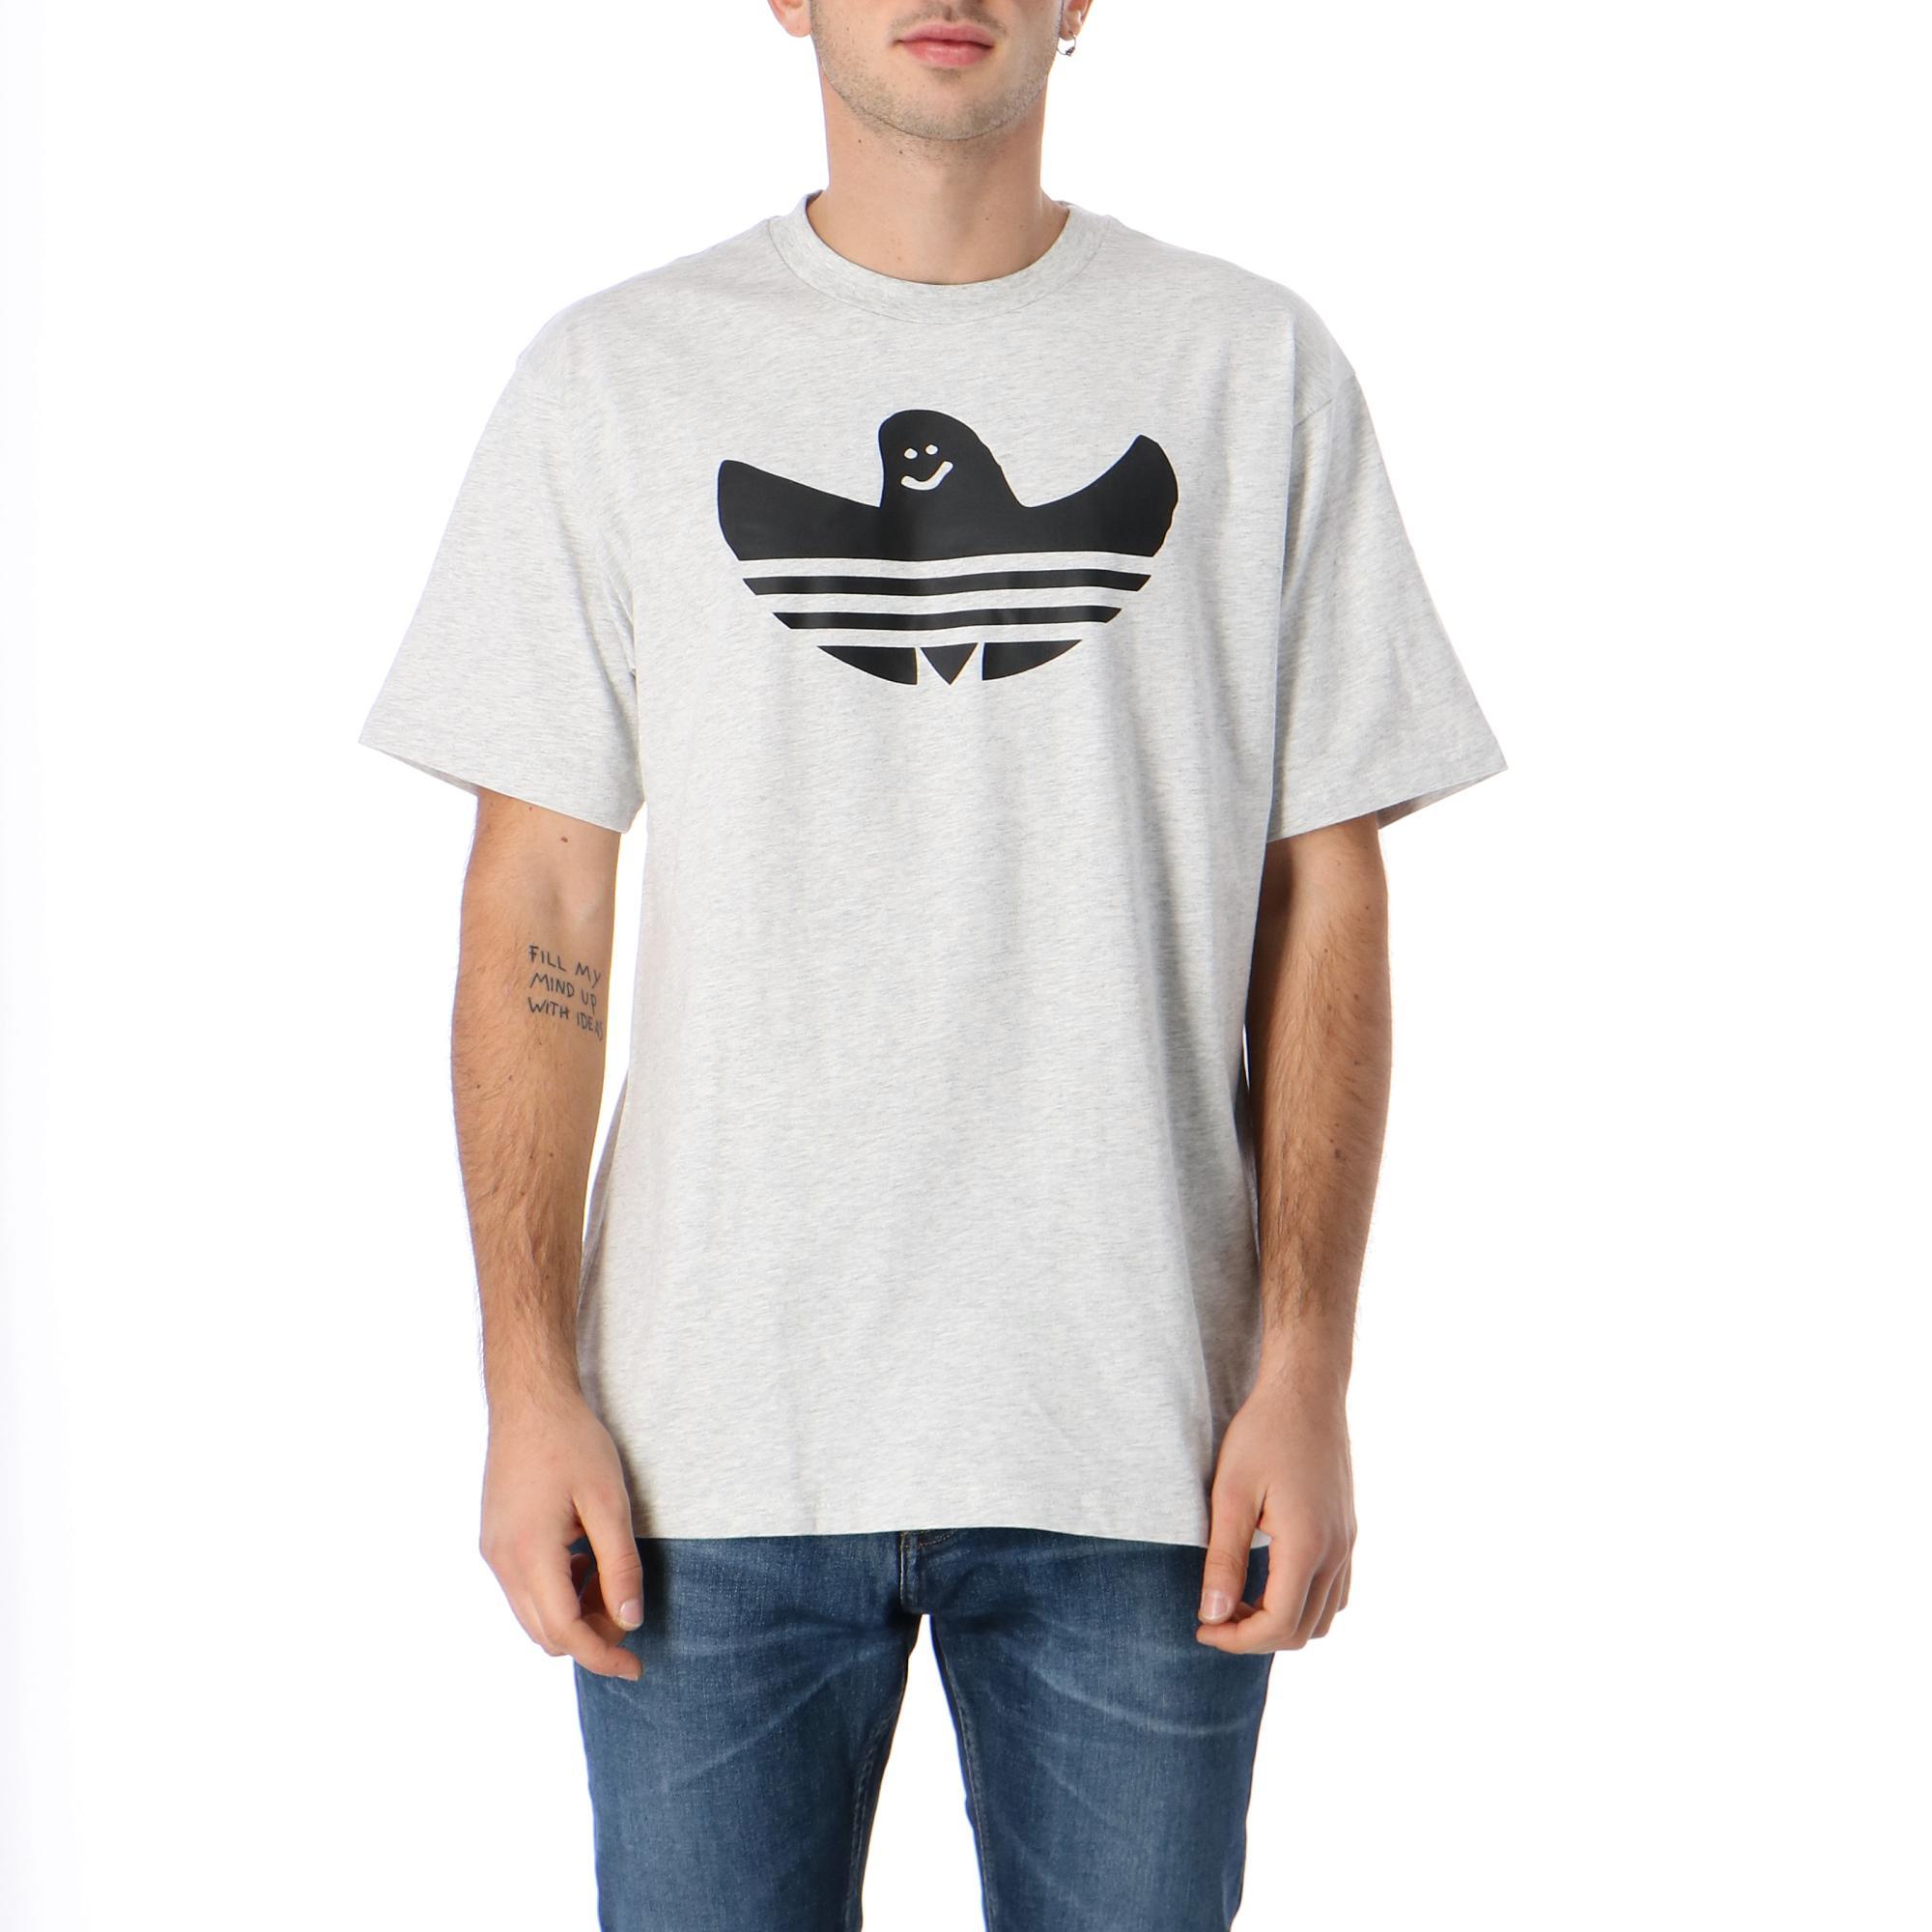 Adidas Ss G Shmoo Tee<br/><br/> <br/> Light grey heather